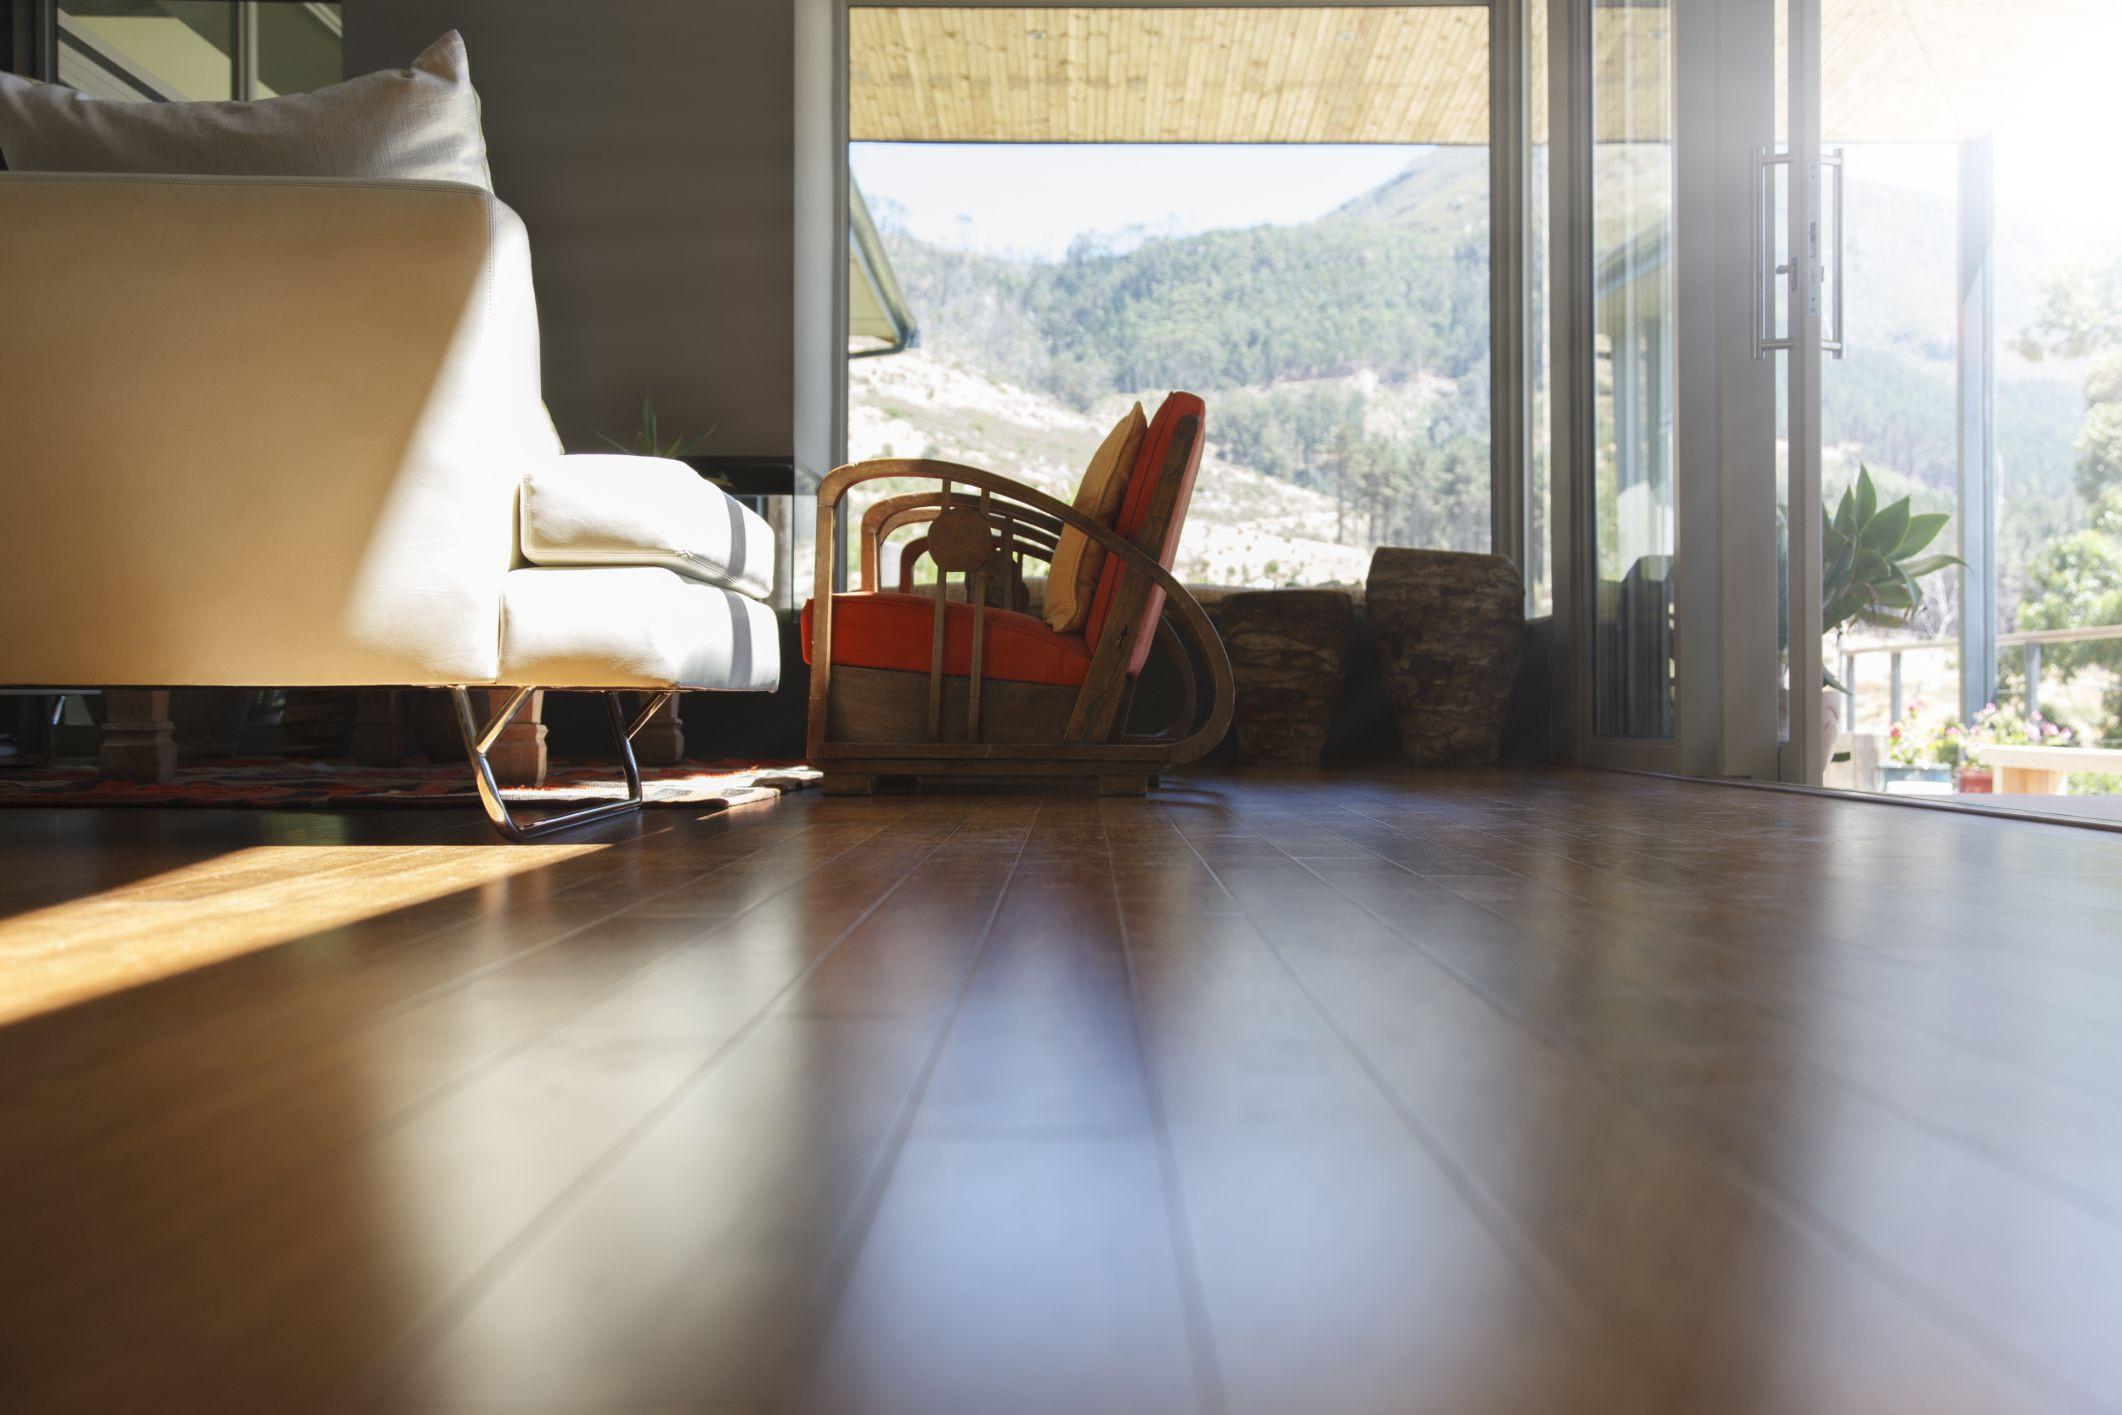 hardwood flooring prices canada of pros and cons of bellawood flooring from lumber liquidators regarding exotic hardwood flooring 525439899 56a49d3a3df78cf77283453d